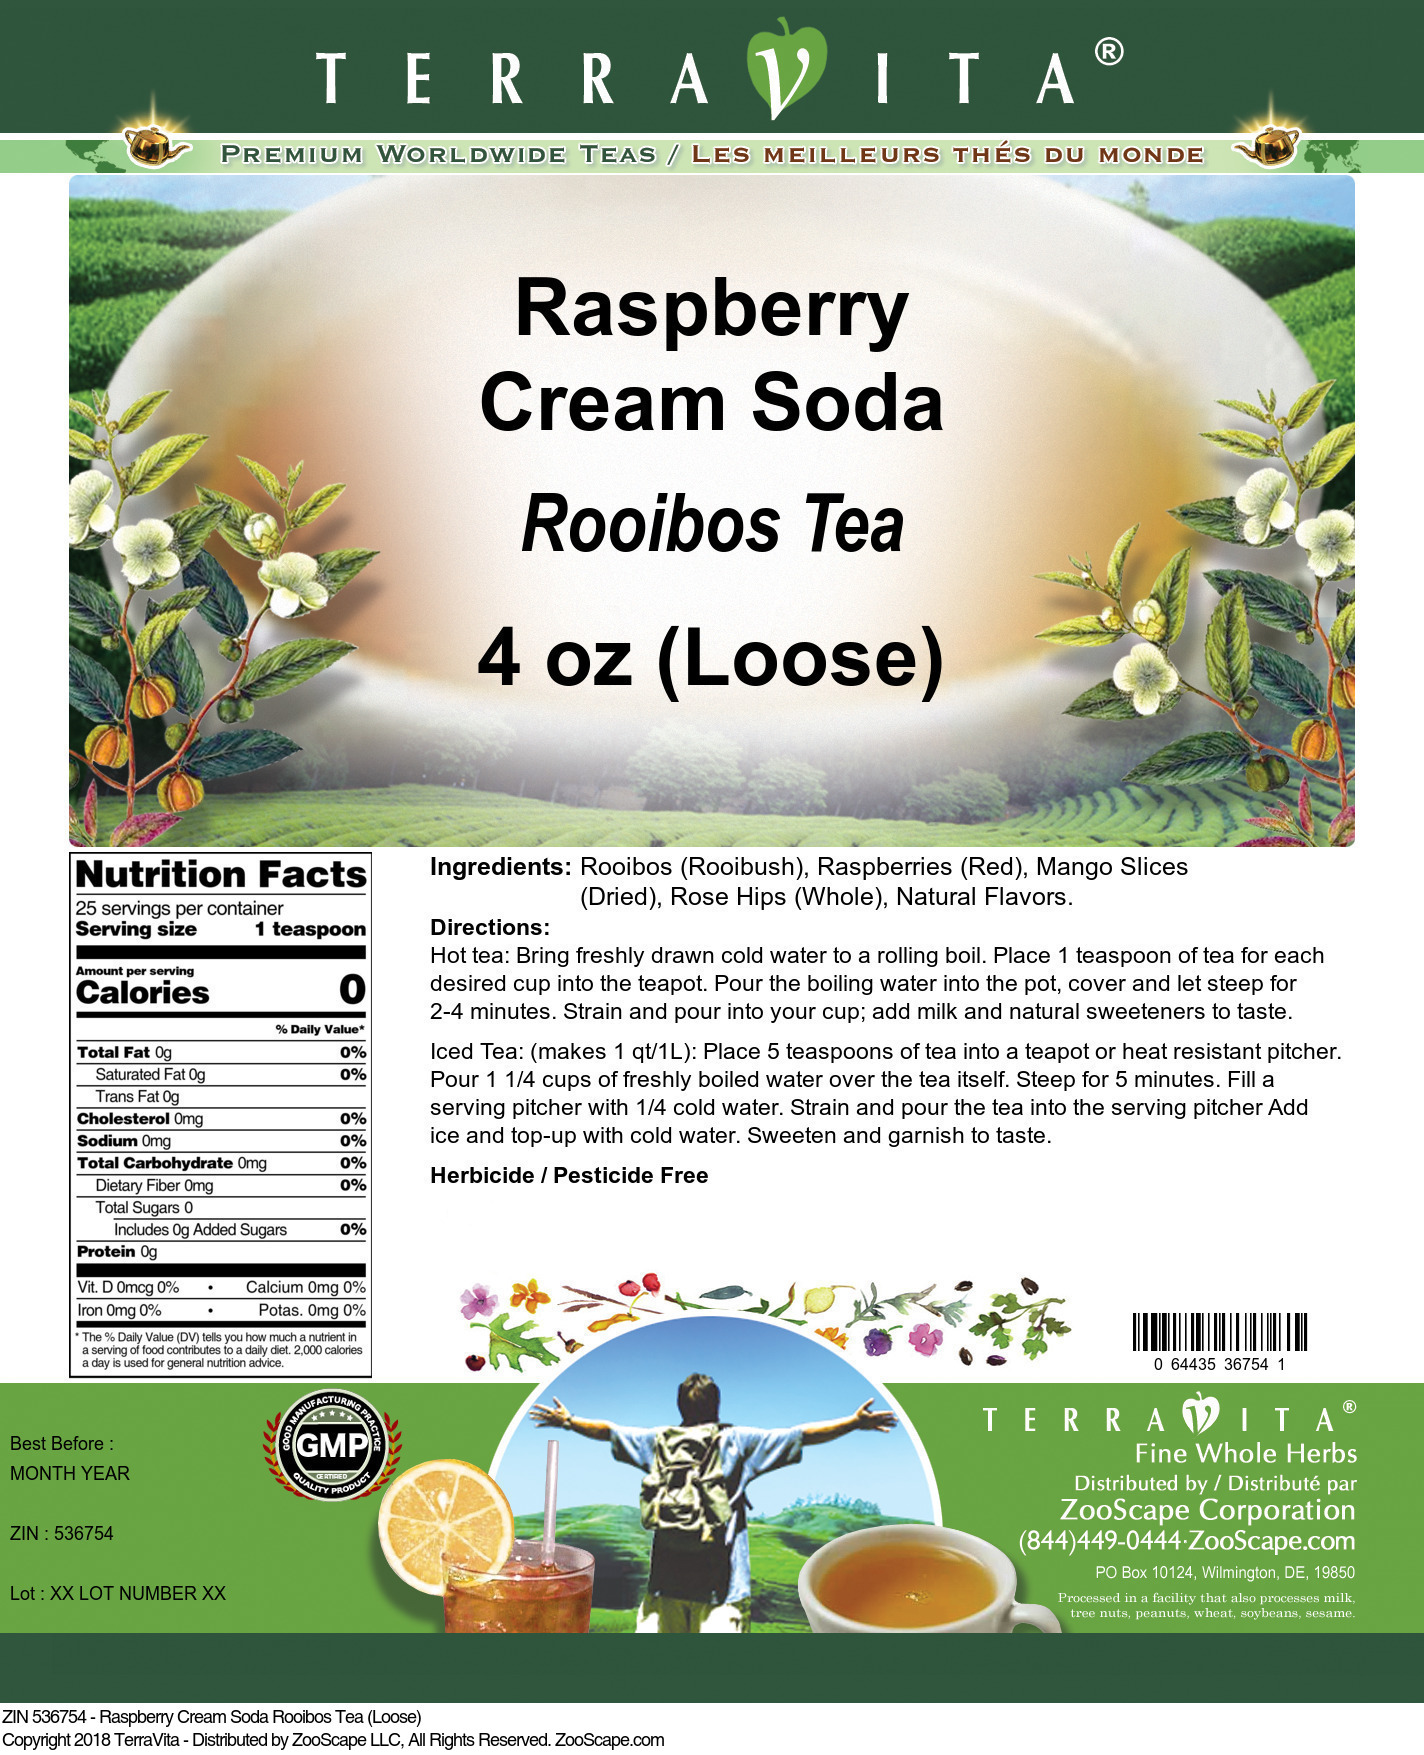 Raspberry Cream Soda Rooibos Tea (Loose)